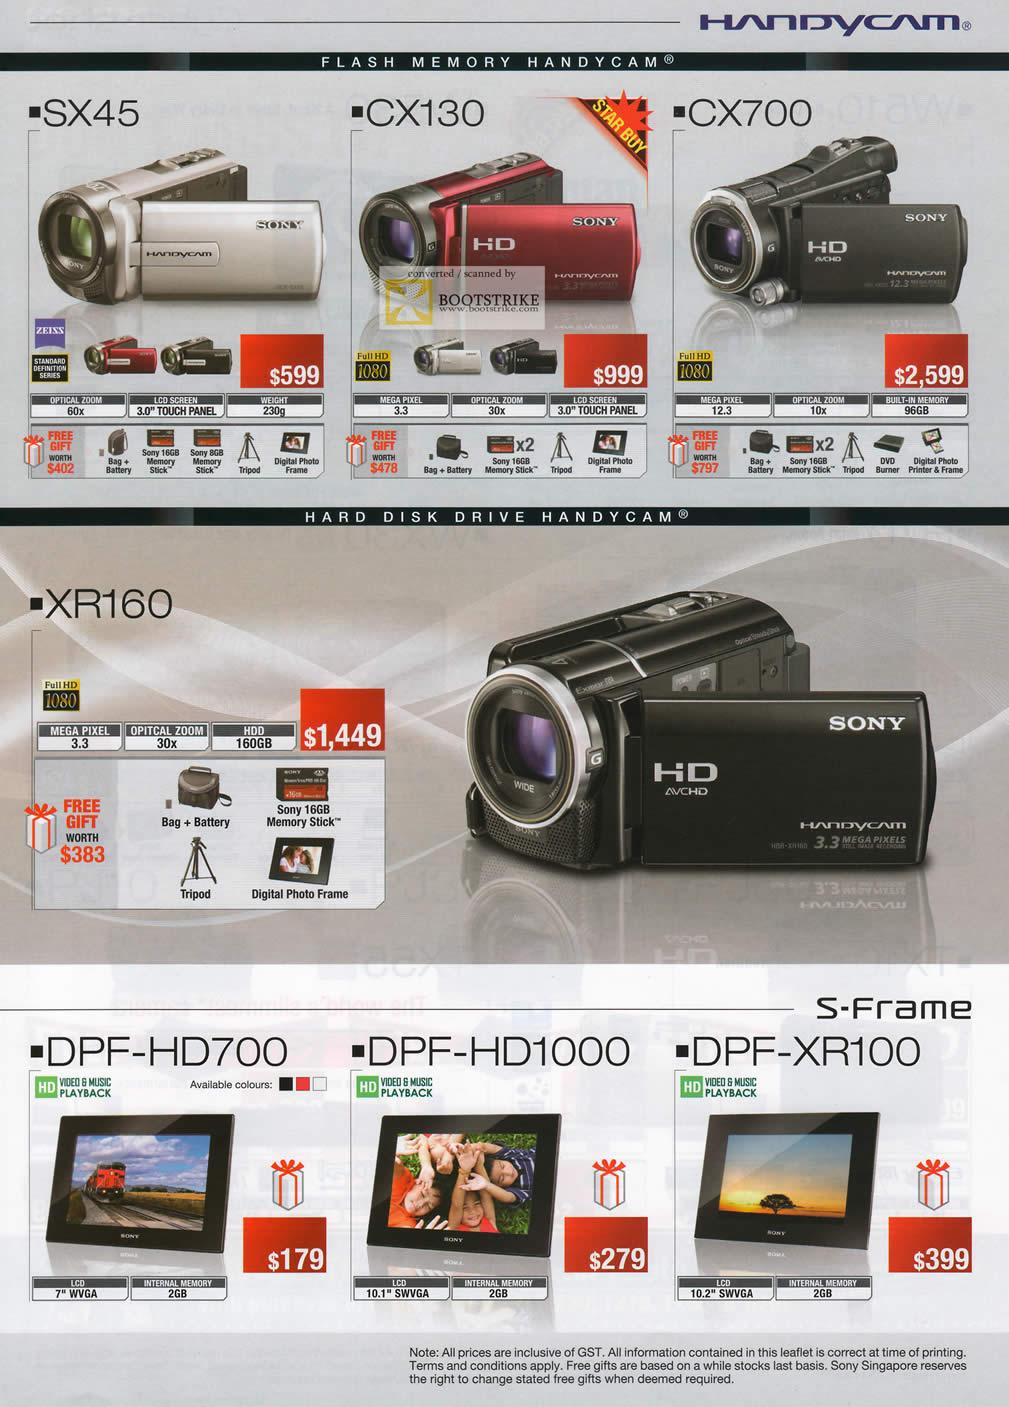 SITEX 2011 price list image brochure of Sony Handycam Video Camcorder DCR SX45, CX130, CX700, XR160, S-Frame Digital Photo Frame DPF-HD700, DPF-HD1000, DPF-XR100